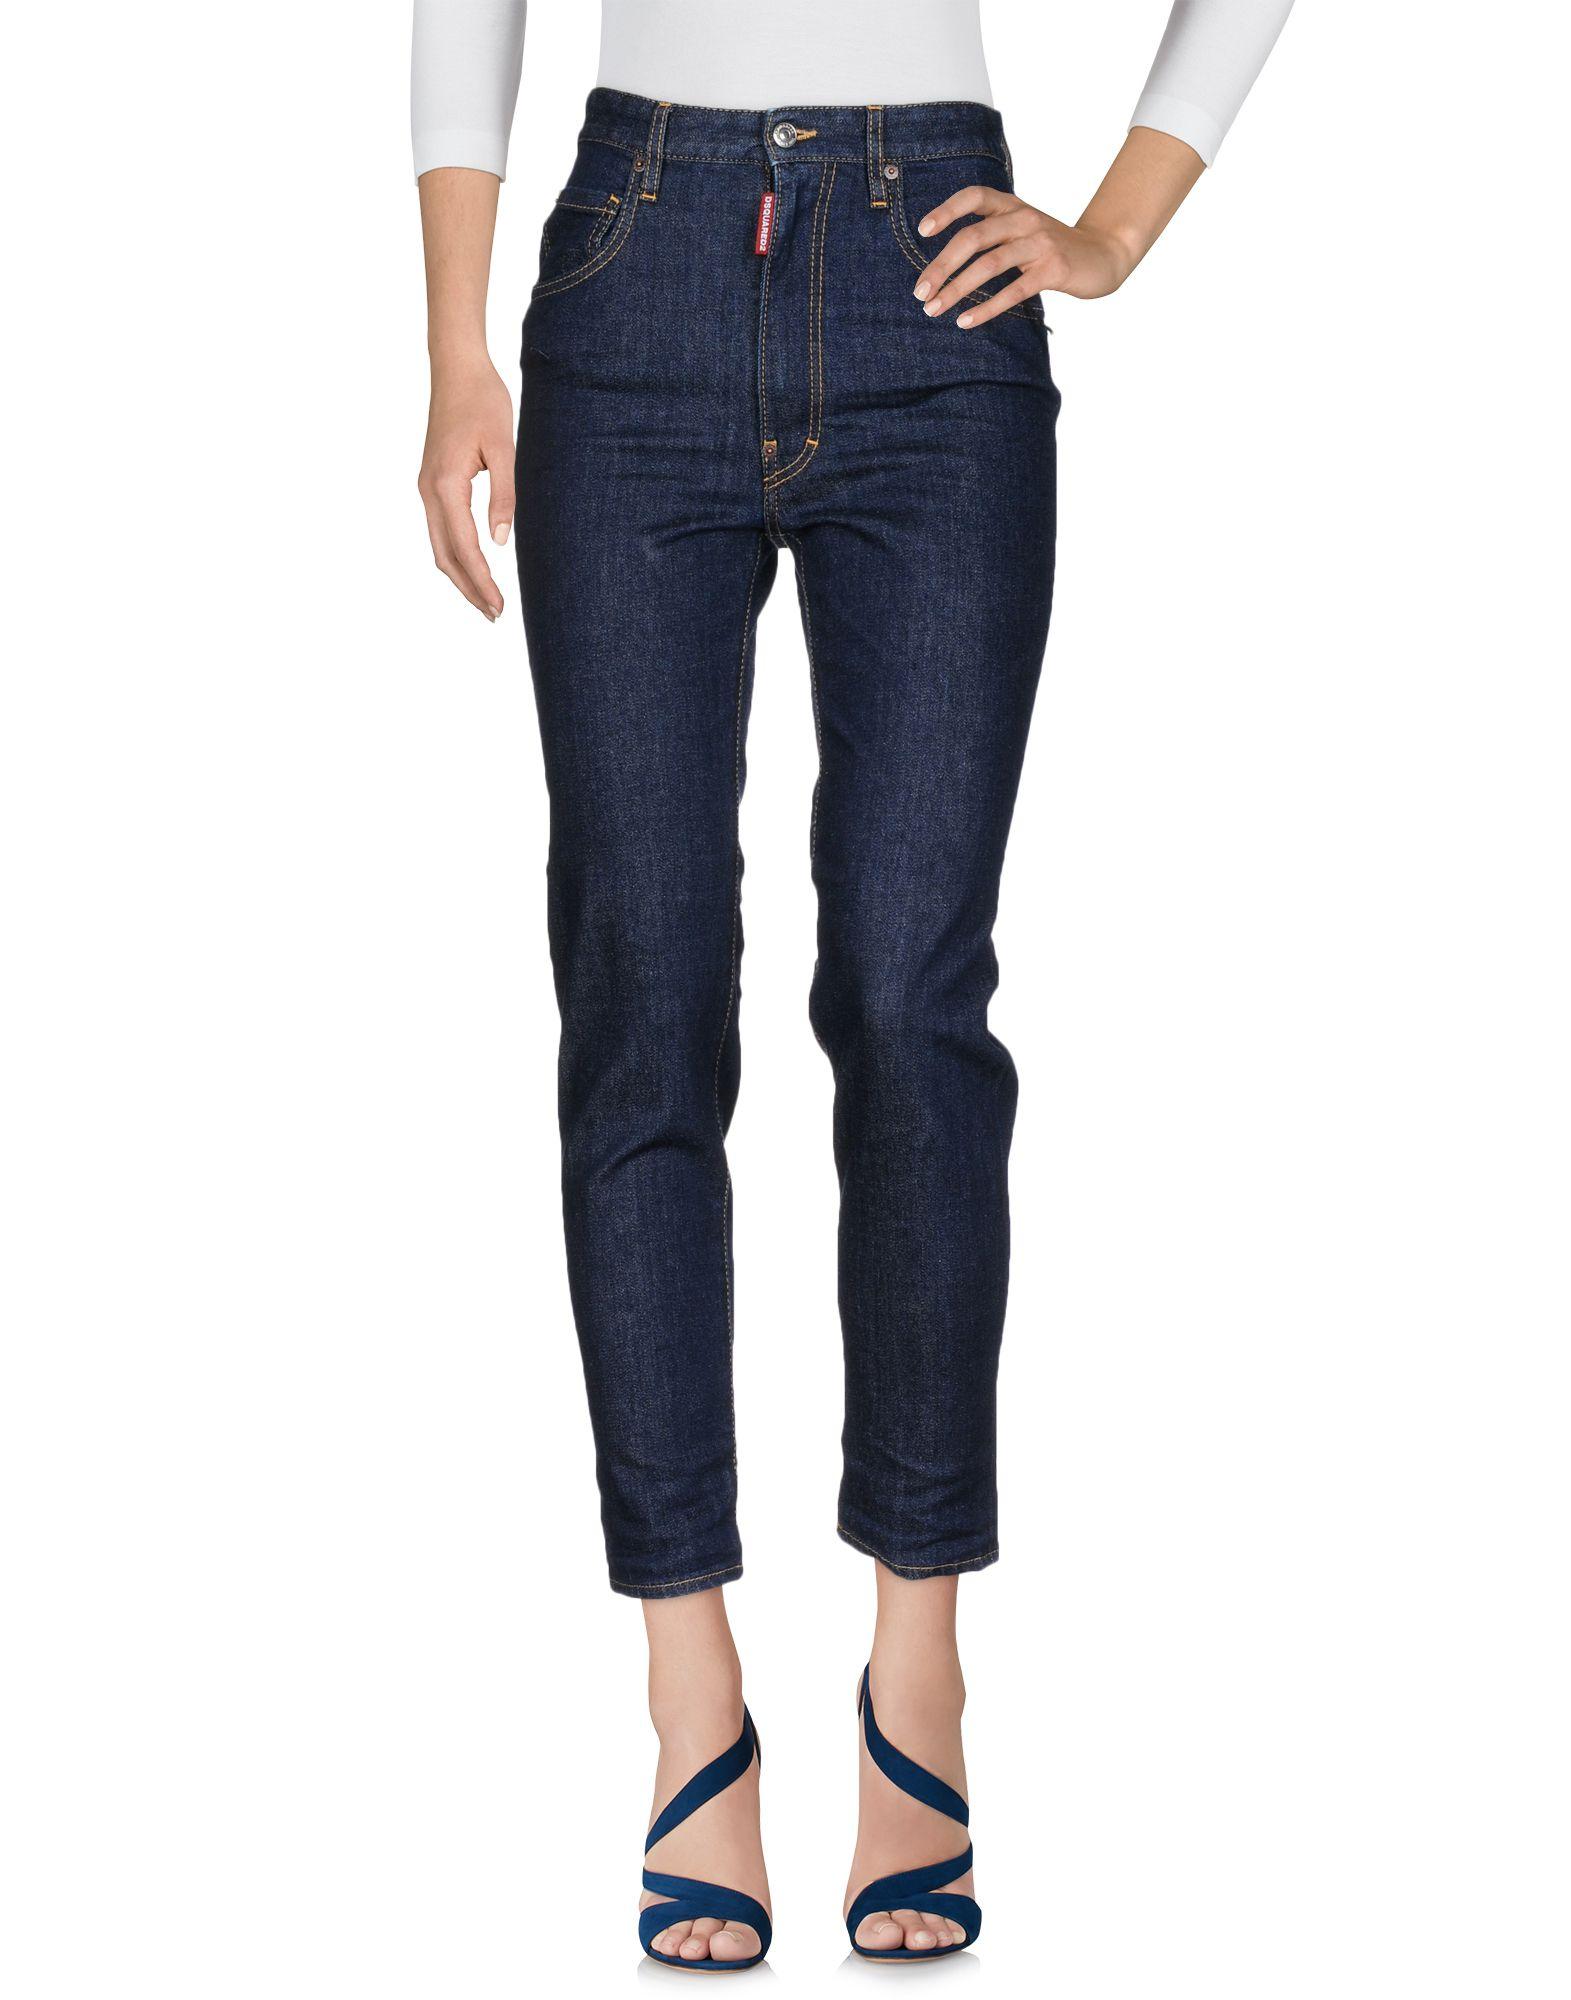 Pantaloni Jeans Dsquared2 Donna - Acquista online su lGrRJyzuf